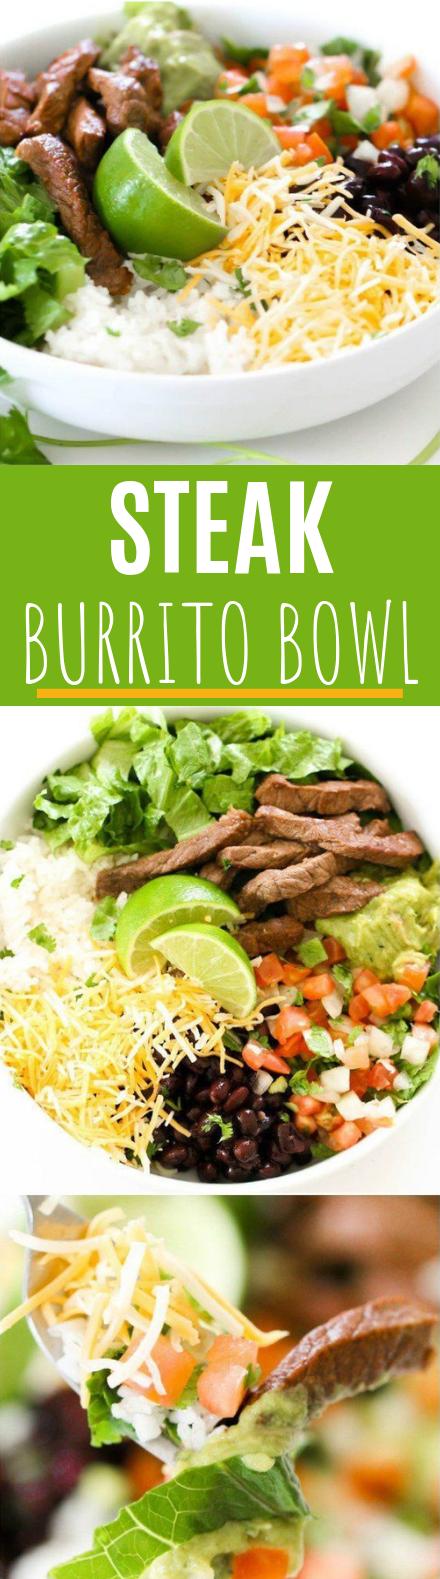 Steak Burrito Bowl #healthy #easy